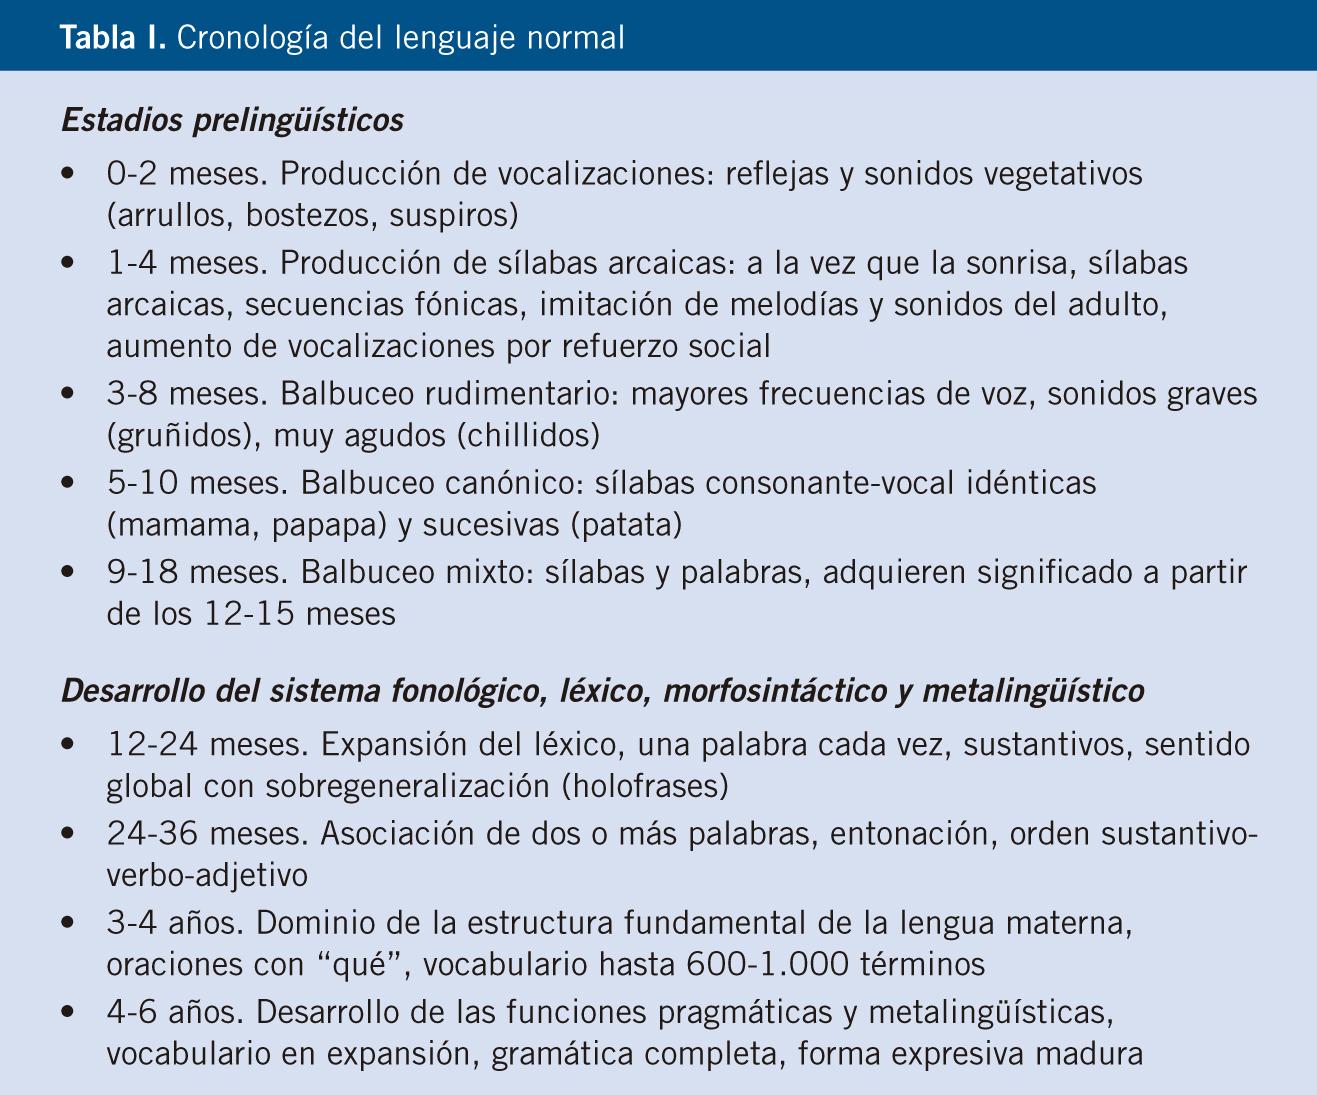 SEMINARIO INTERDISCIPLINARIO GRUPO 2016-2: septiembre 2015